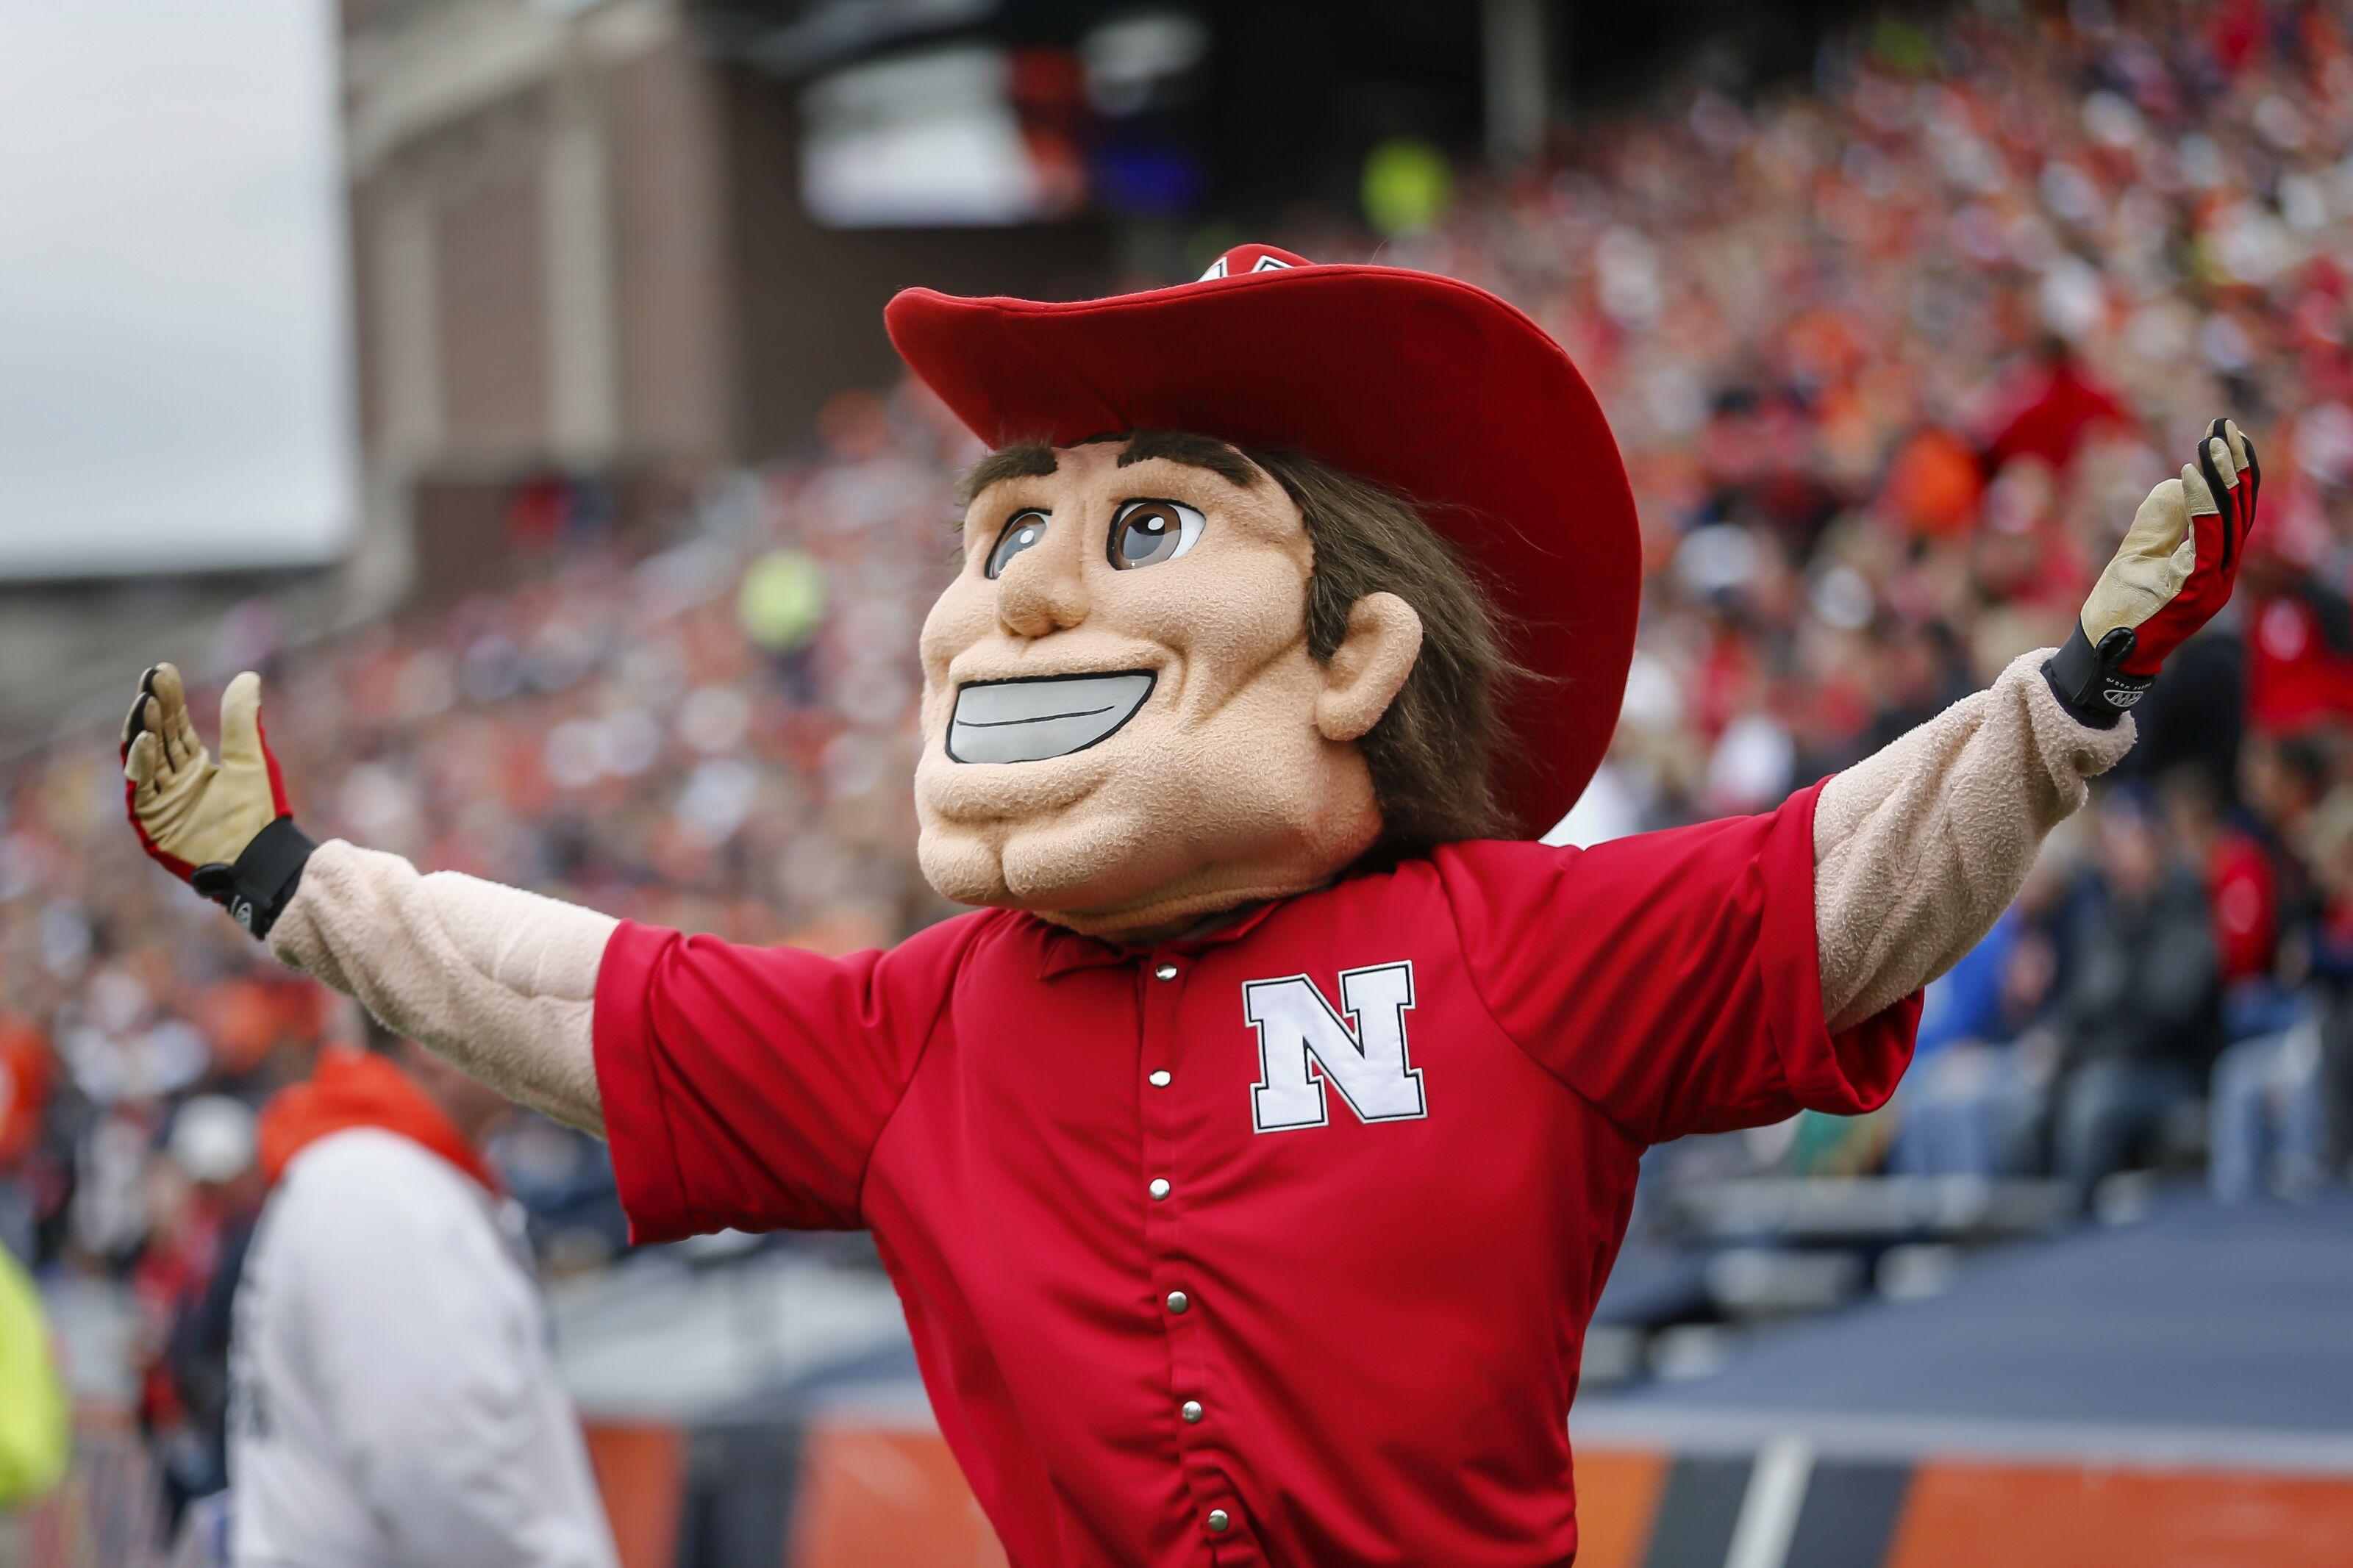 Nebraska Football: Program ranked in latest Associated Press poll